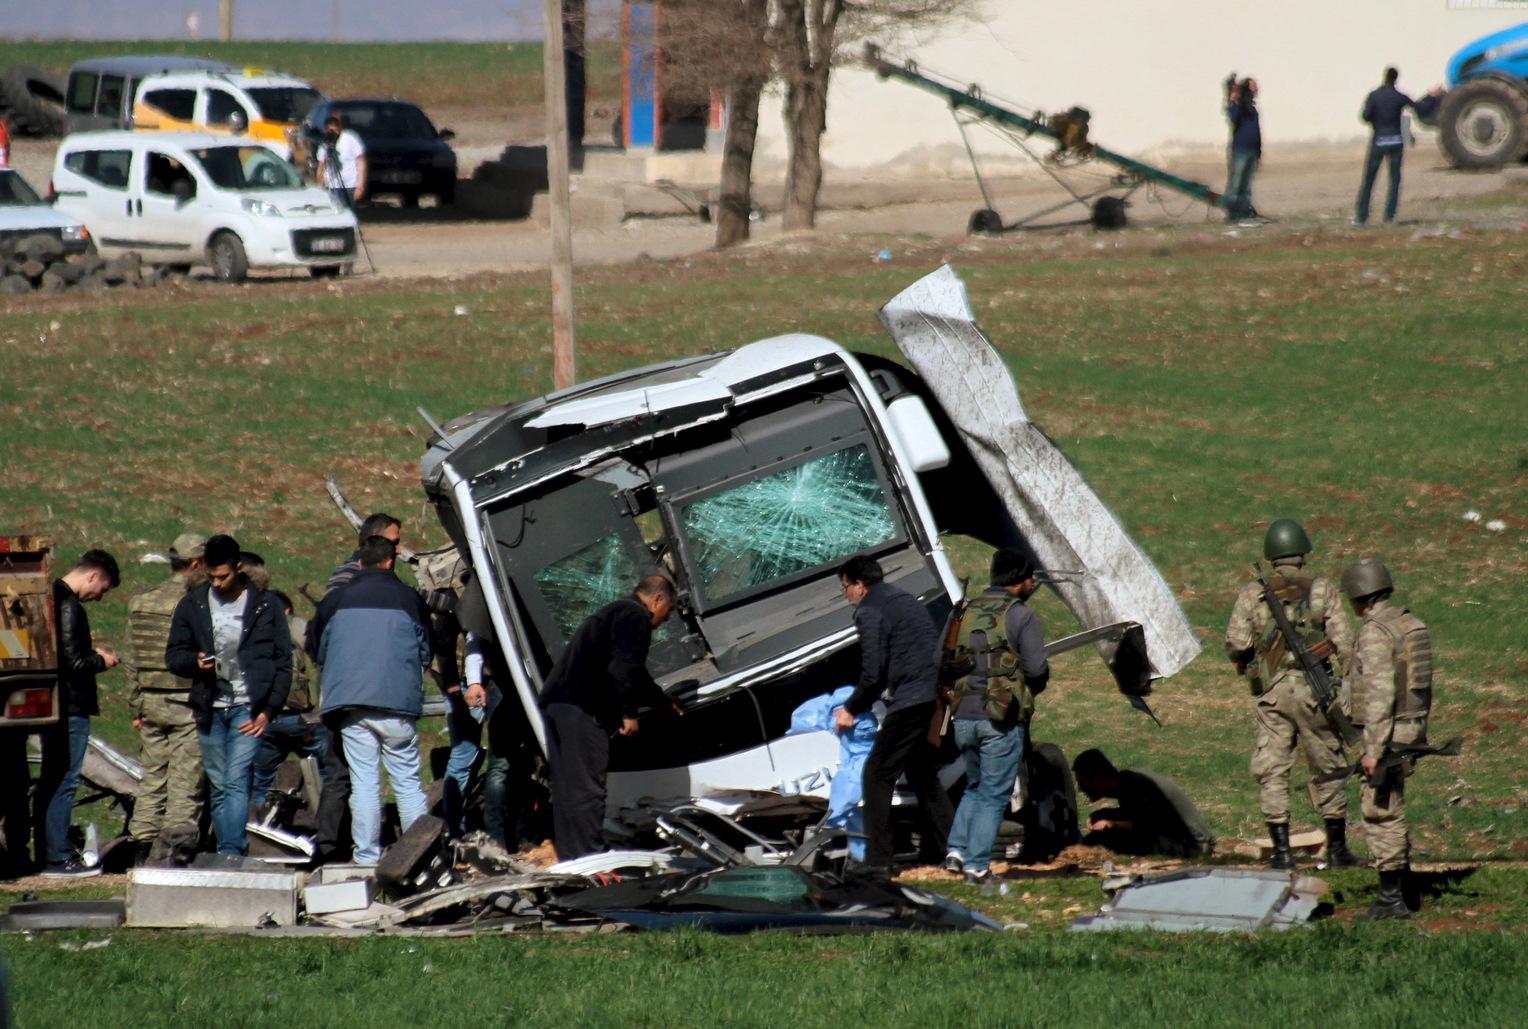 Turkey: 209 People Killed, 862 Injured in Terror Attacks in First Half of 2016